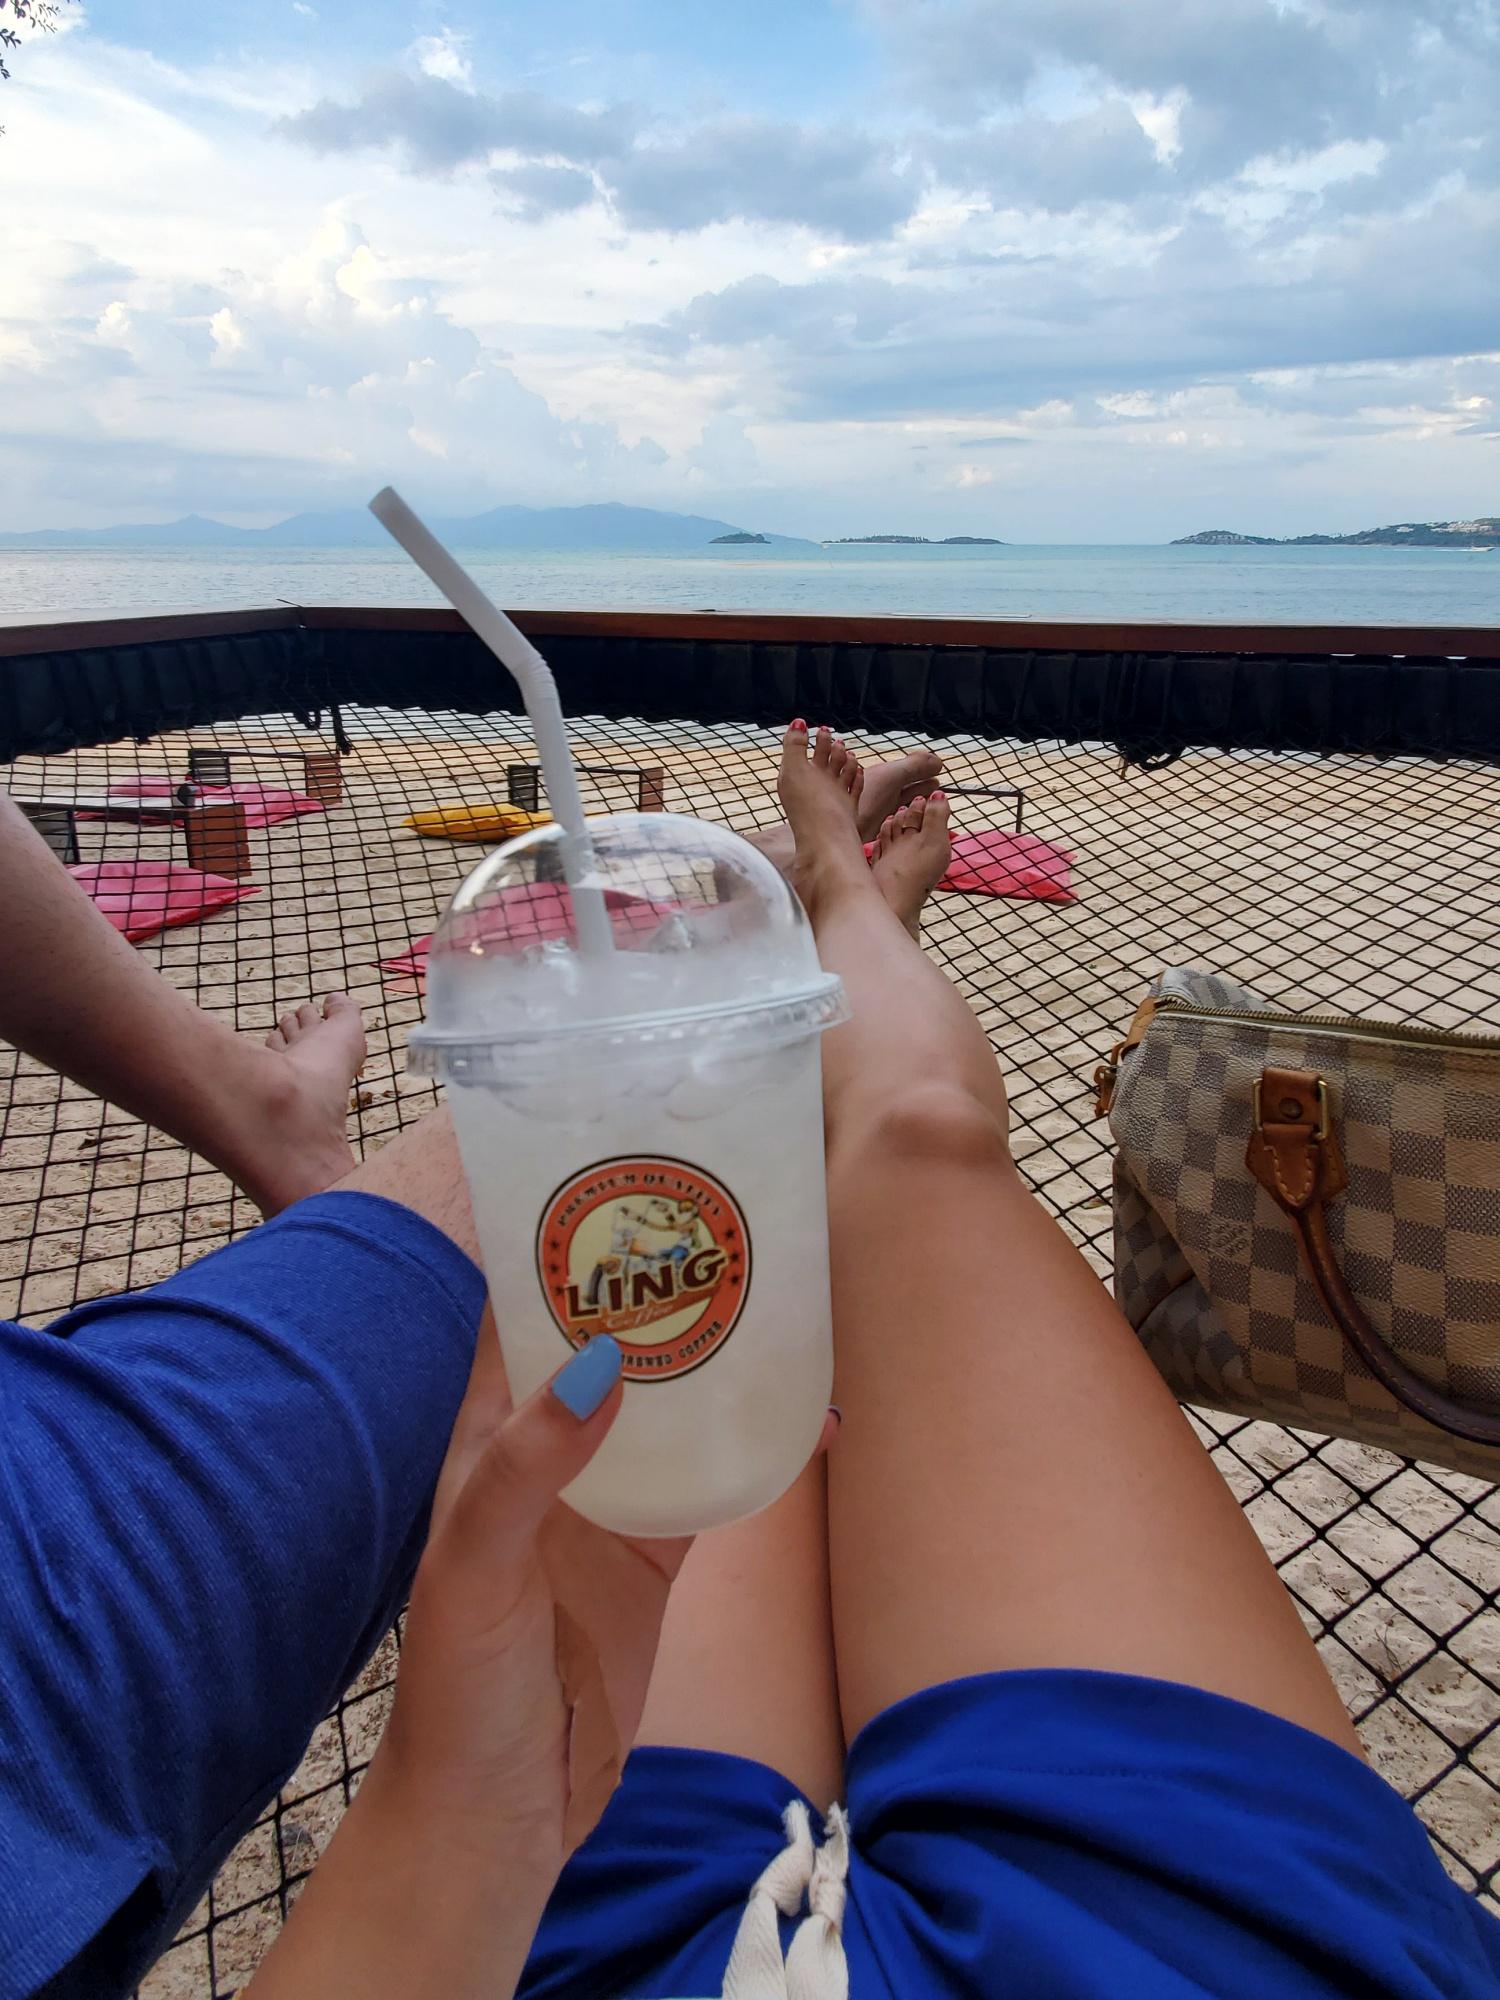 Ling Coffee Koh Samui